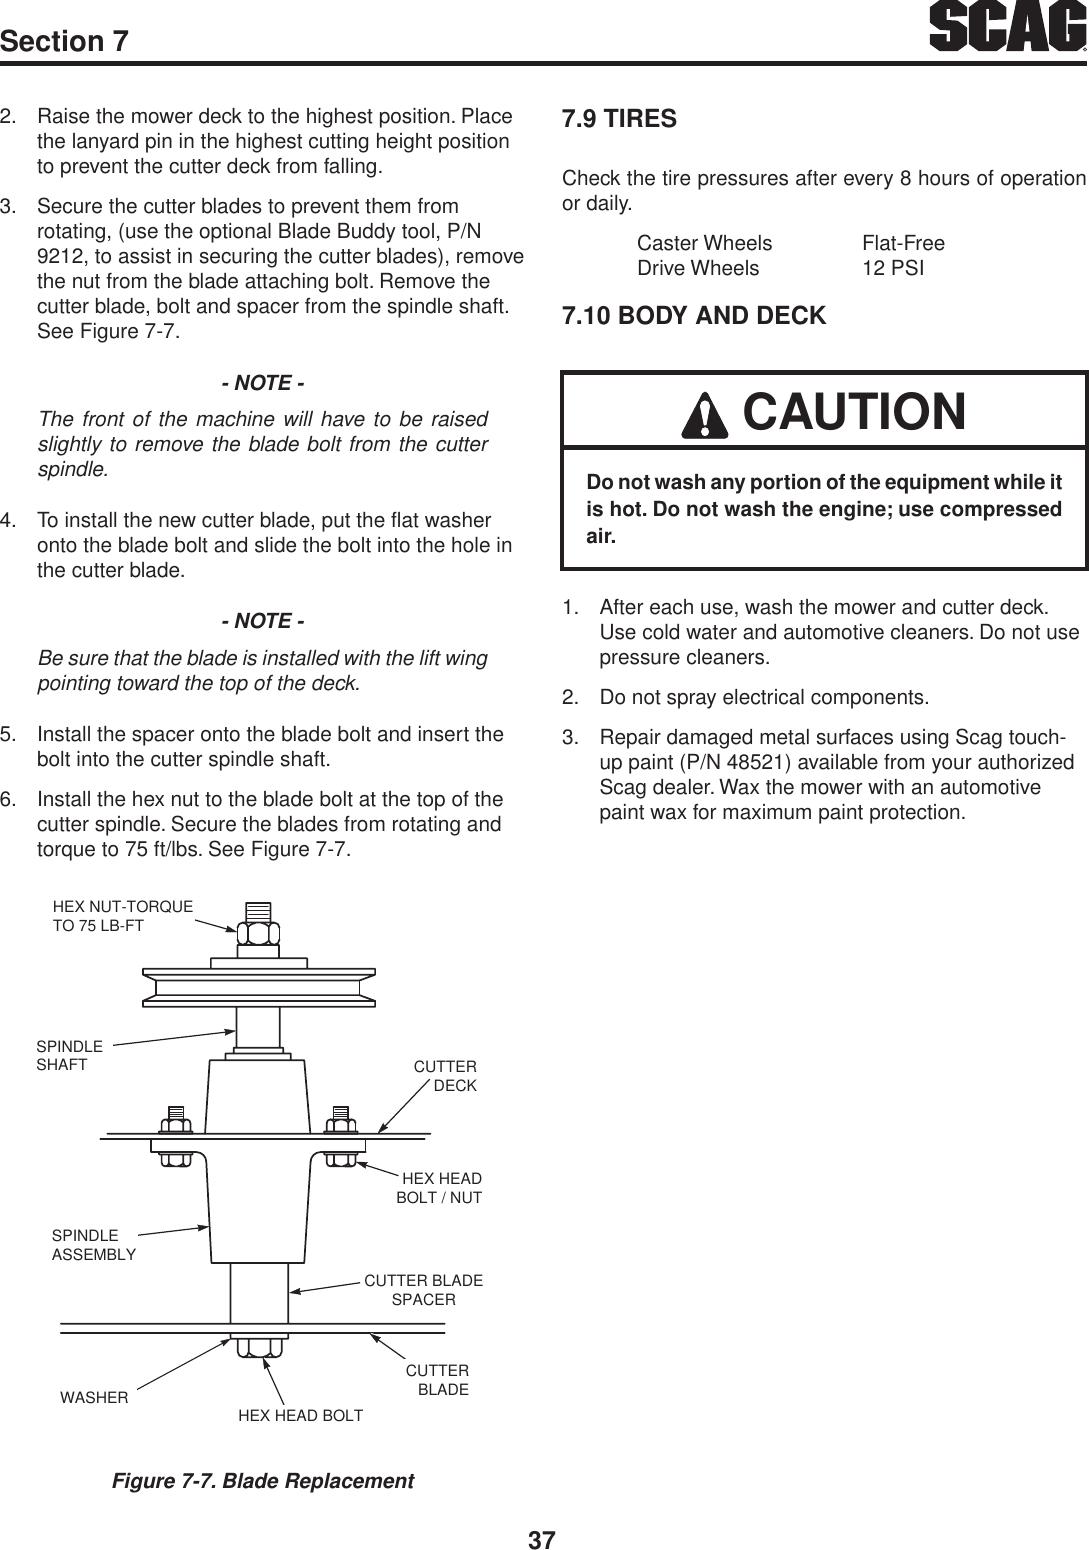 Scag Power Equipment V Ride Svr36A 20Fx Users Manual Operators 03259